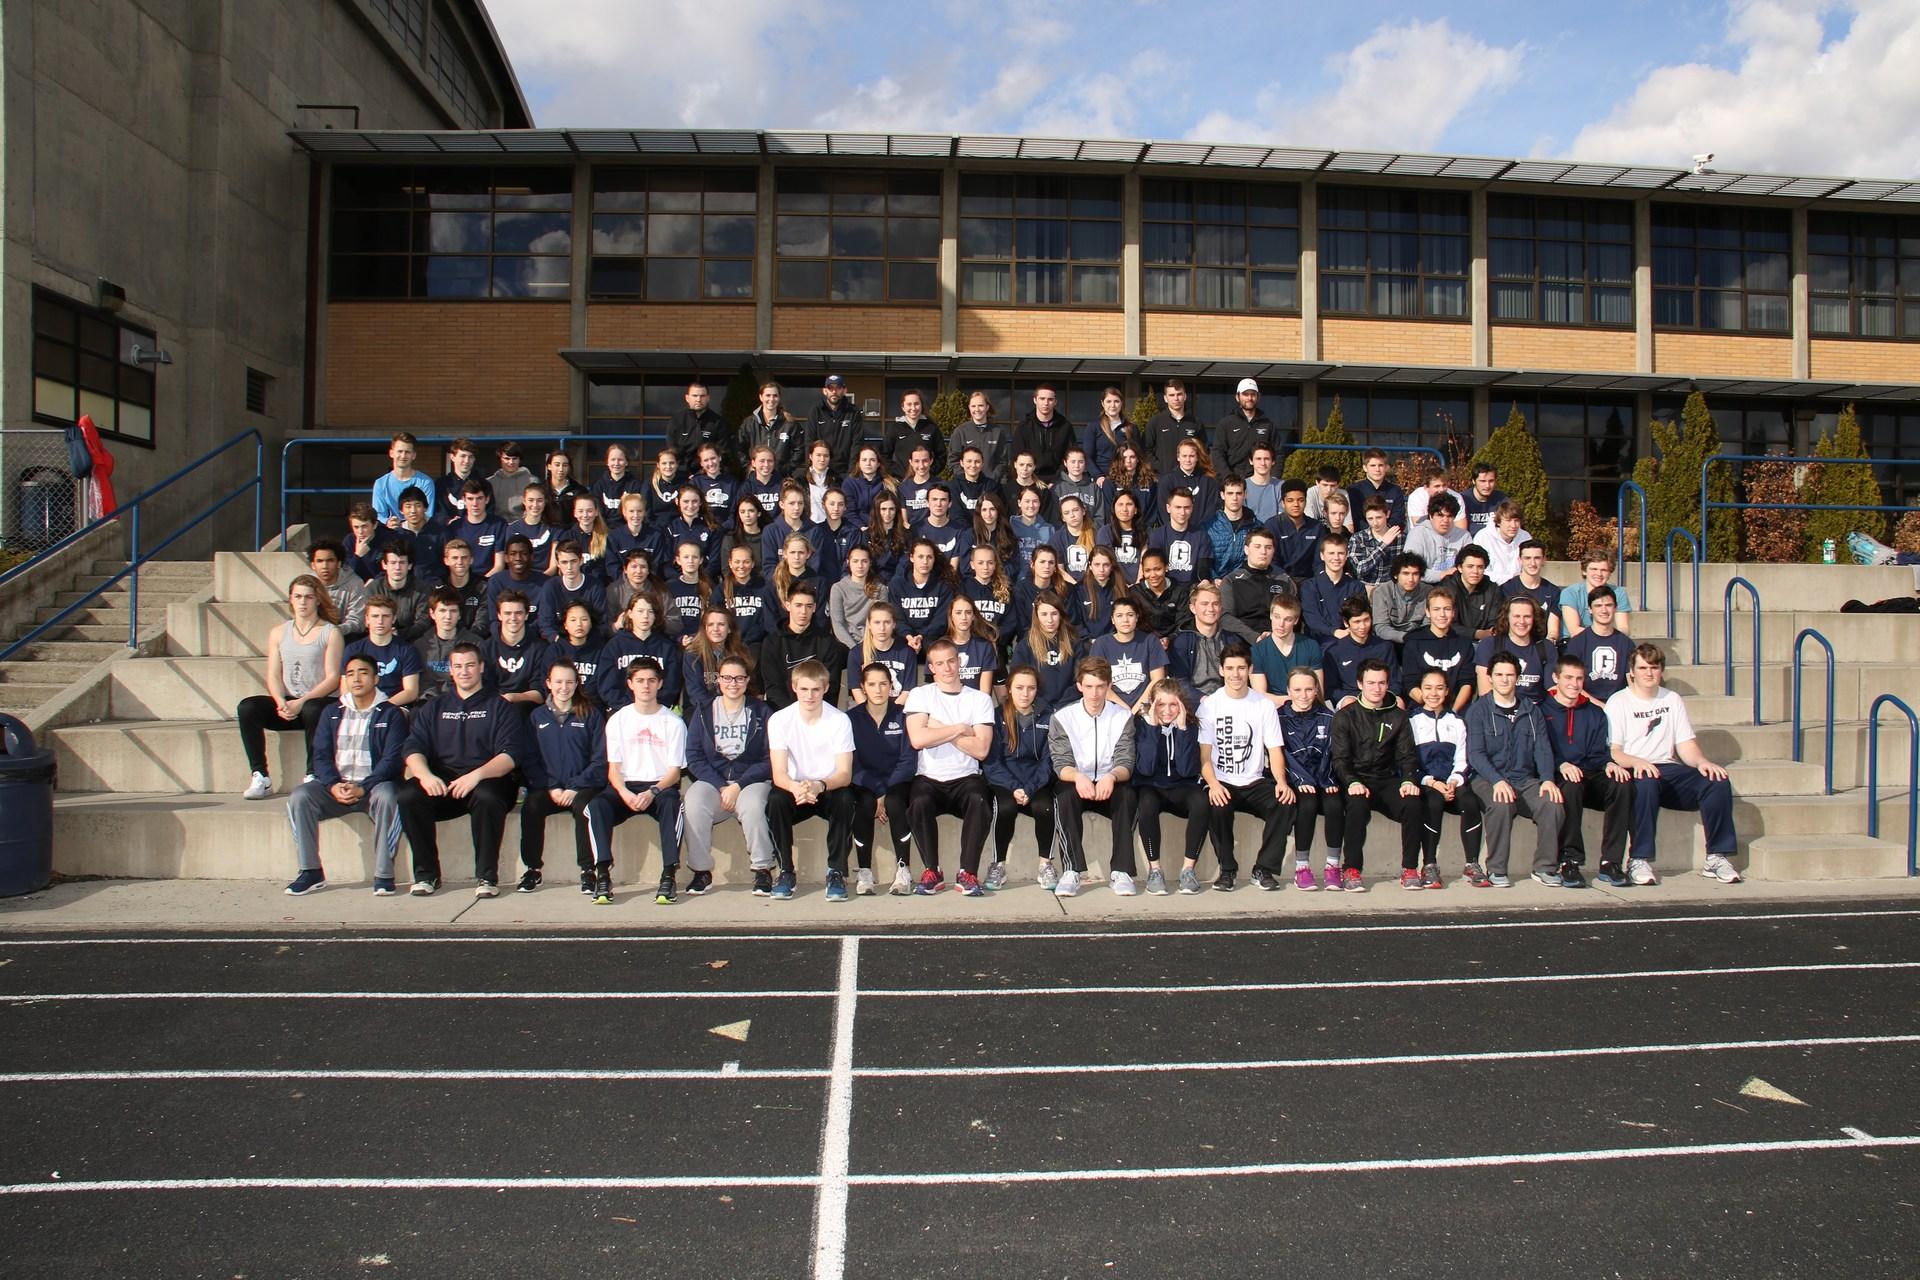 2016 Track & Field Team